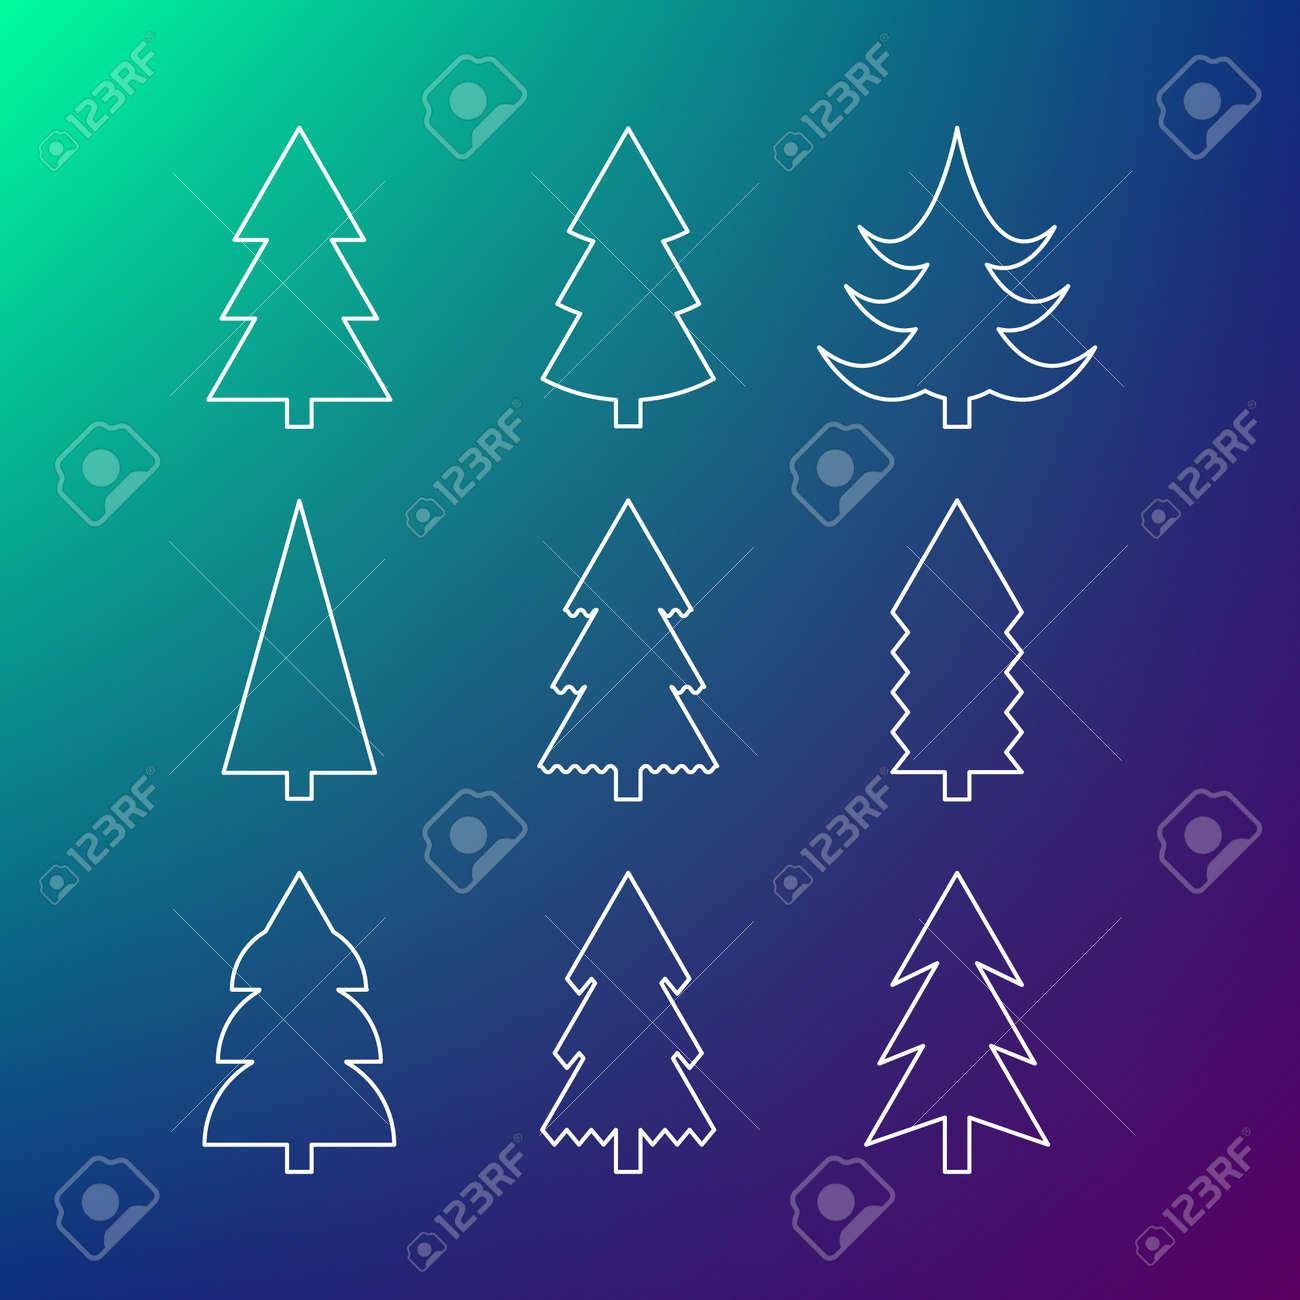 Thin line icon set of Christmas trees. Winter trees icon. 9 different Christmas trees thin line icons. - 50426819